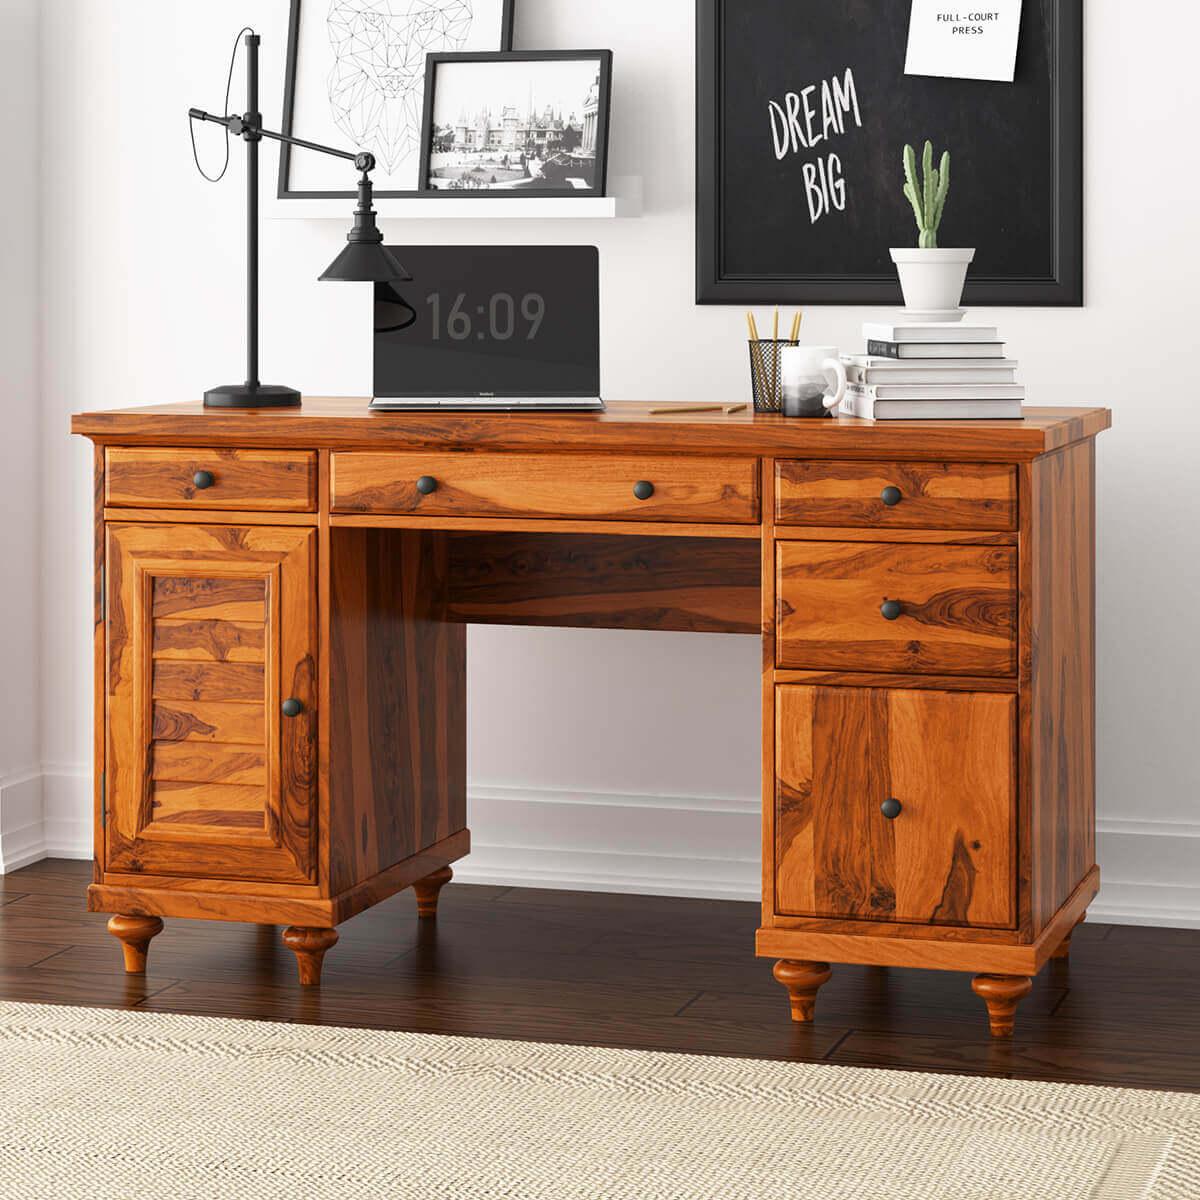 - Clarkton Rustic Solid Wood Computer Desk With Louvered Door